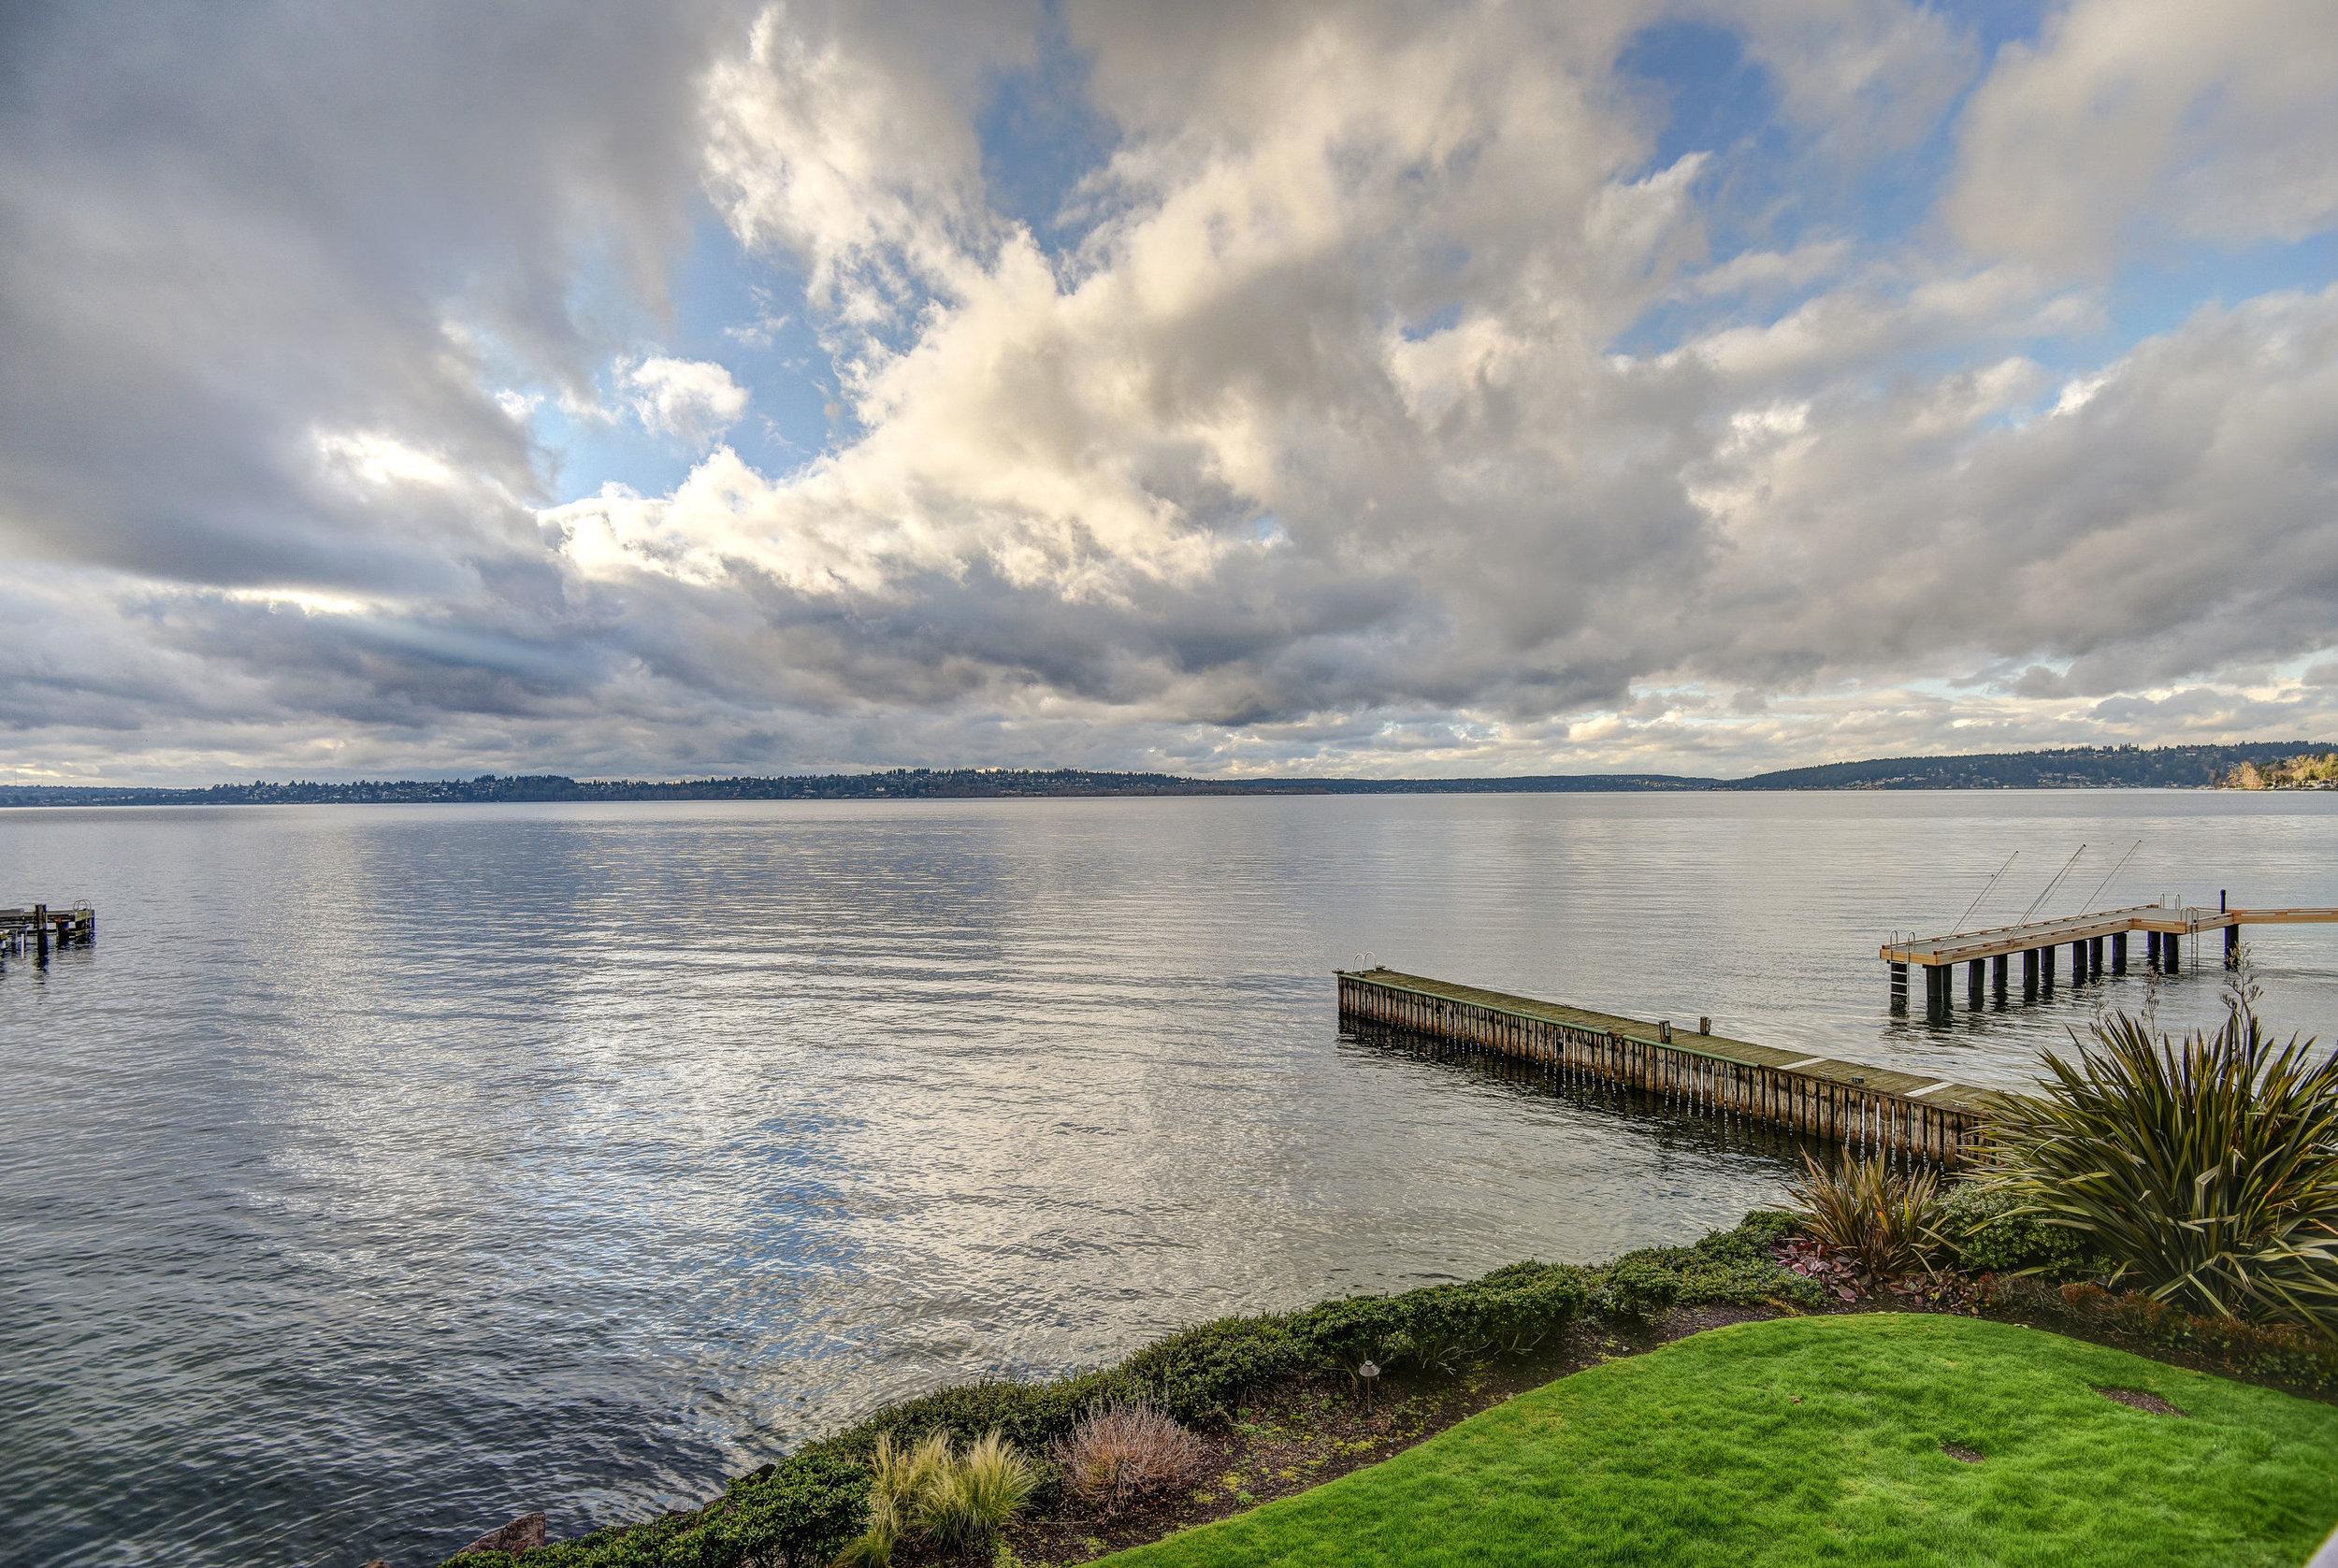 6401 Lake Washington Blvd NE-print-018-18-DENNON 6401AndyK 18-2700x1811-300dpi.jpg